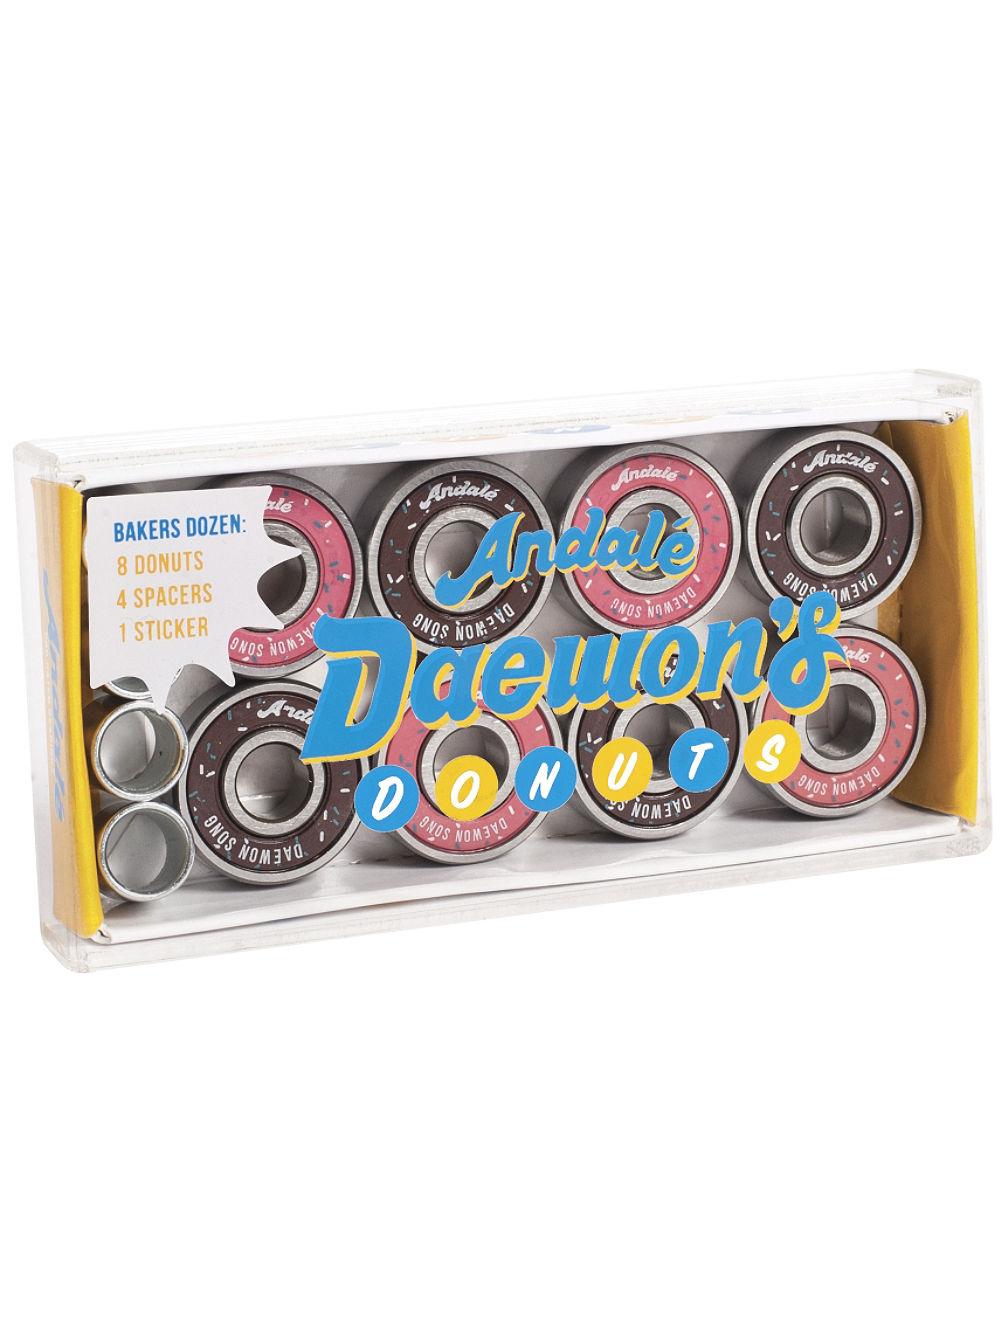 andale-bearings-daewon-song-donut-box